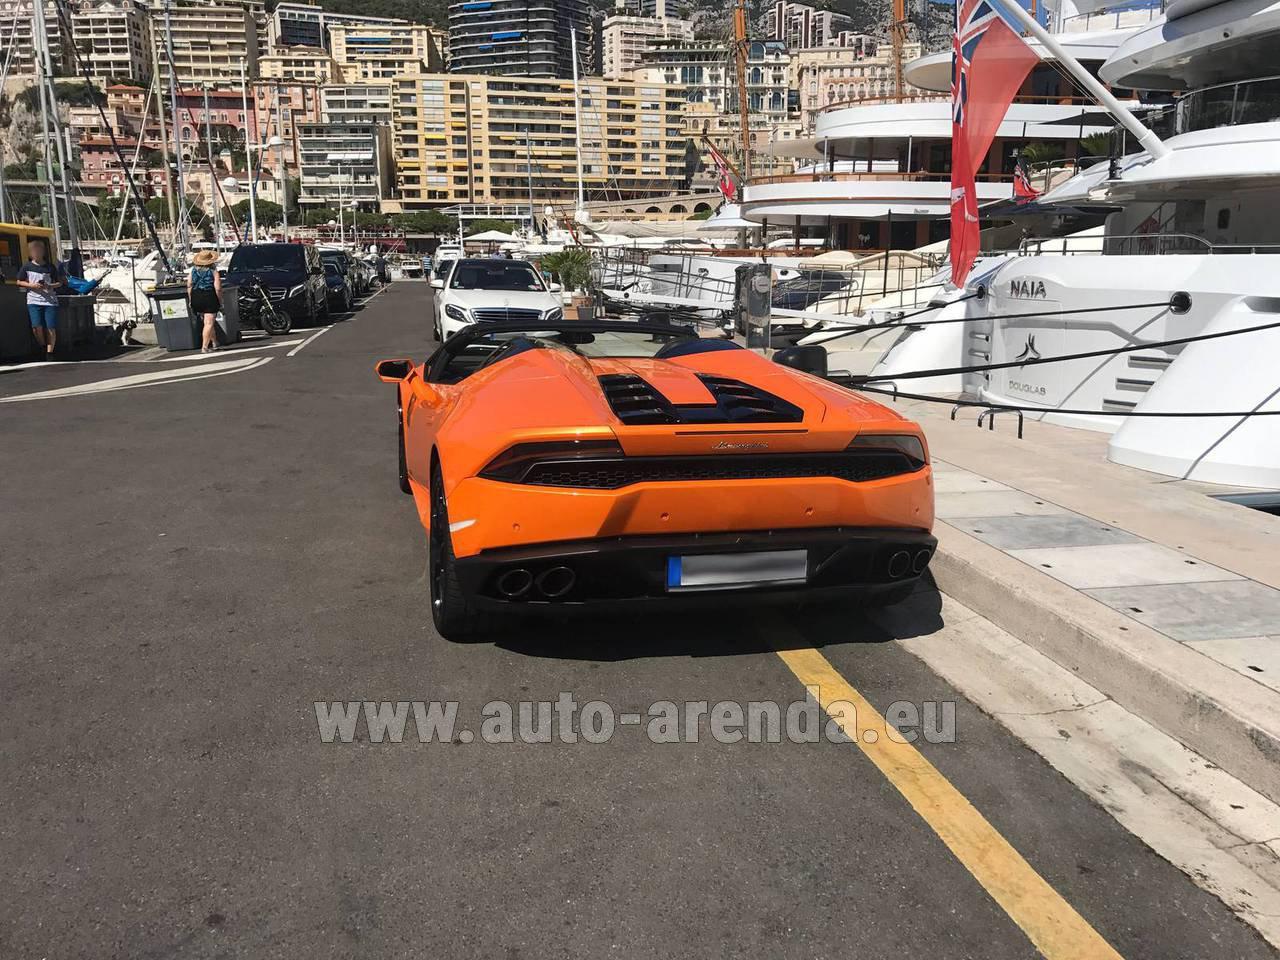 Rent the Lamborghini Huracan Spyder Cabrio car in Luxembourg